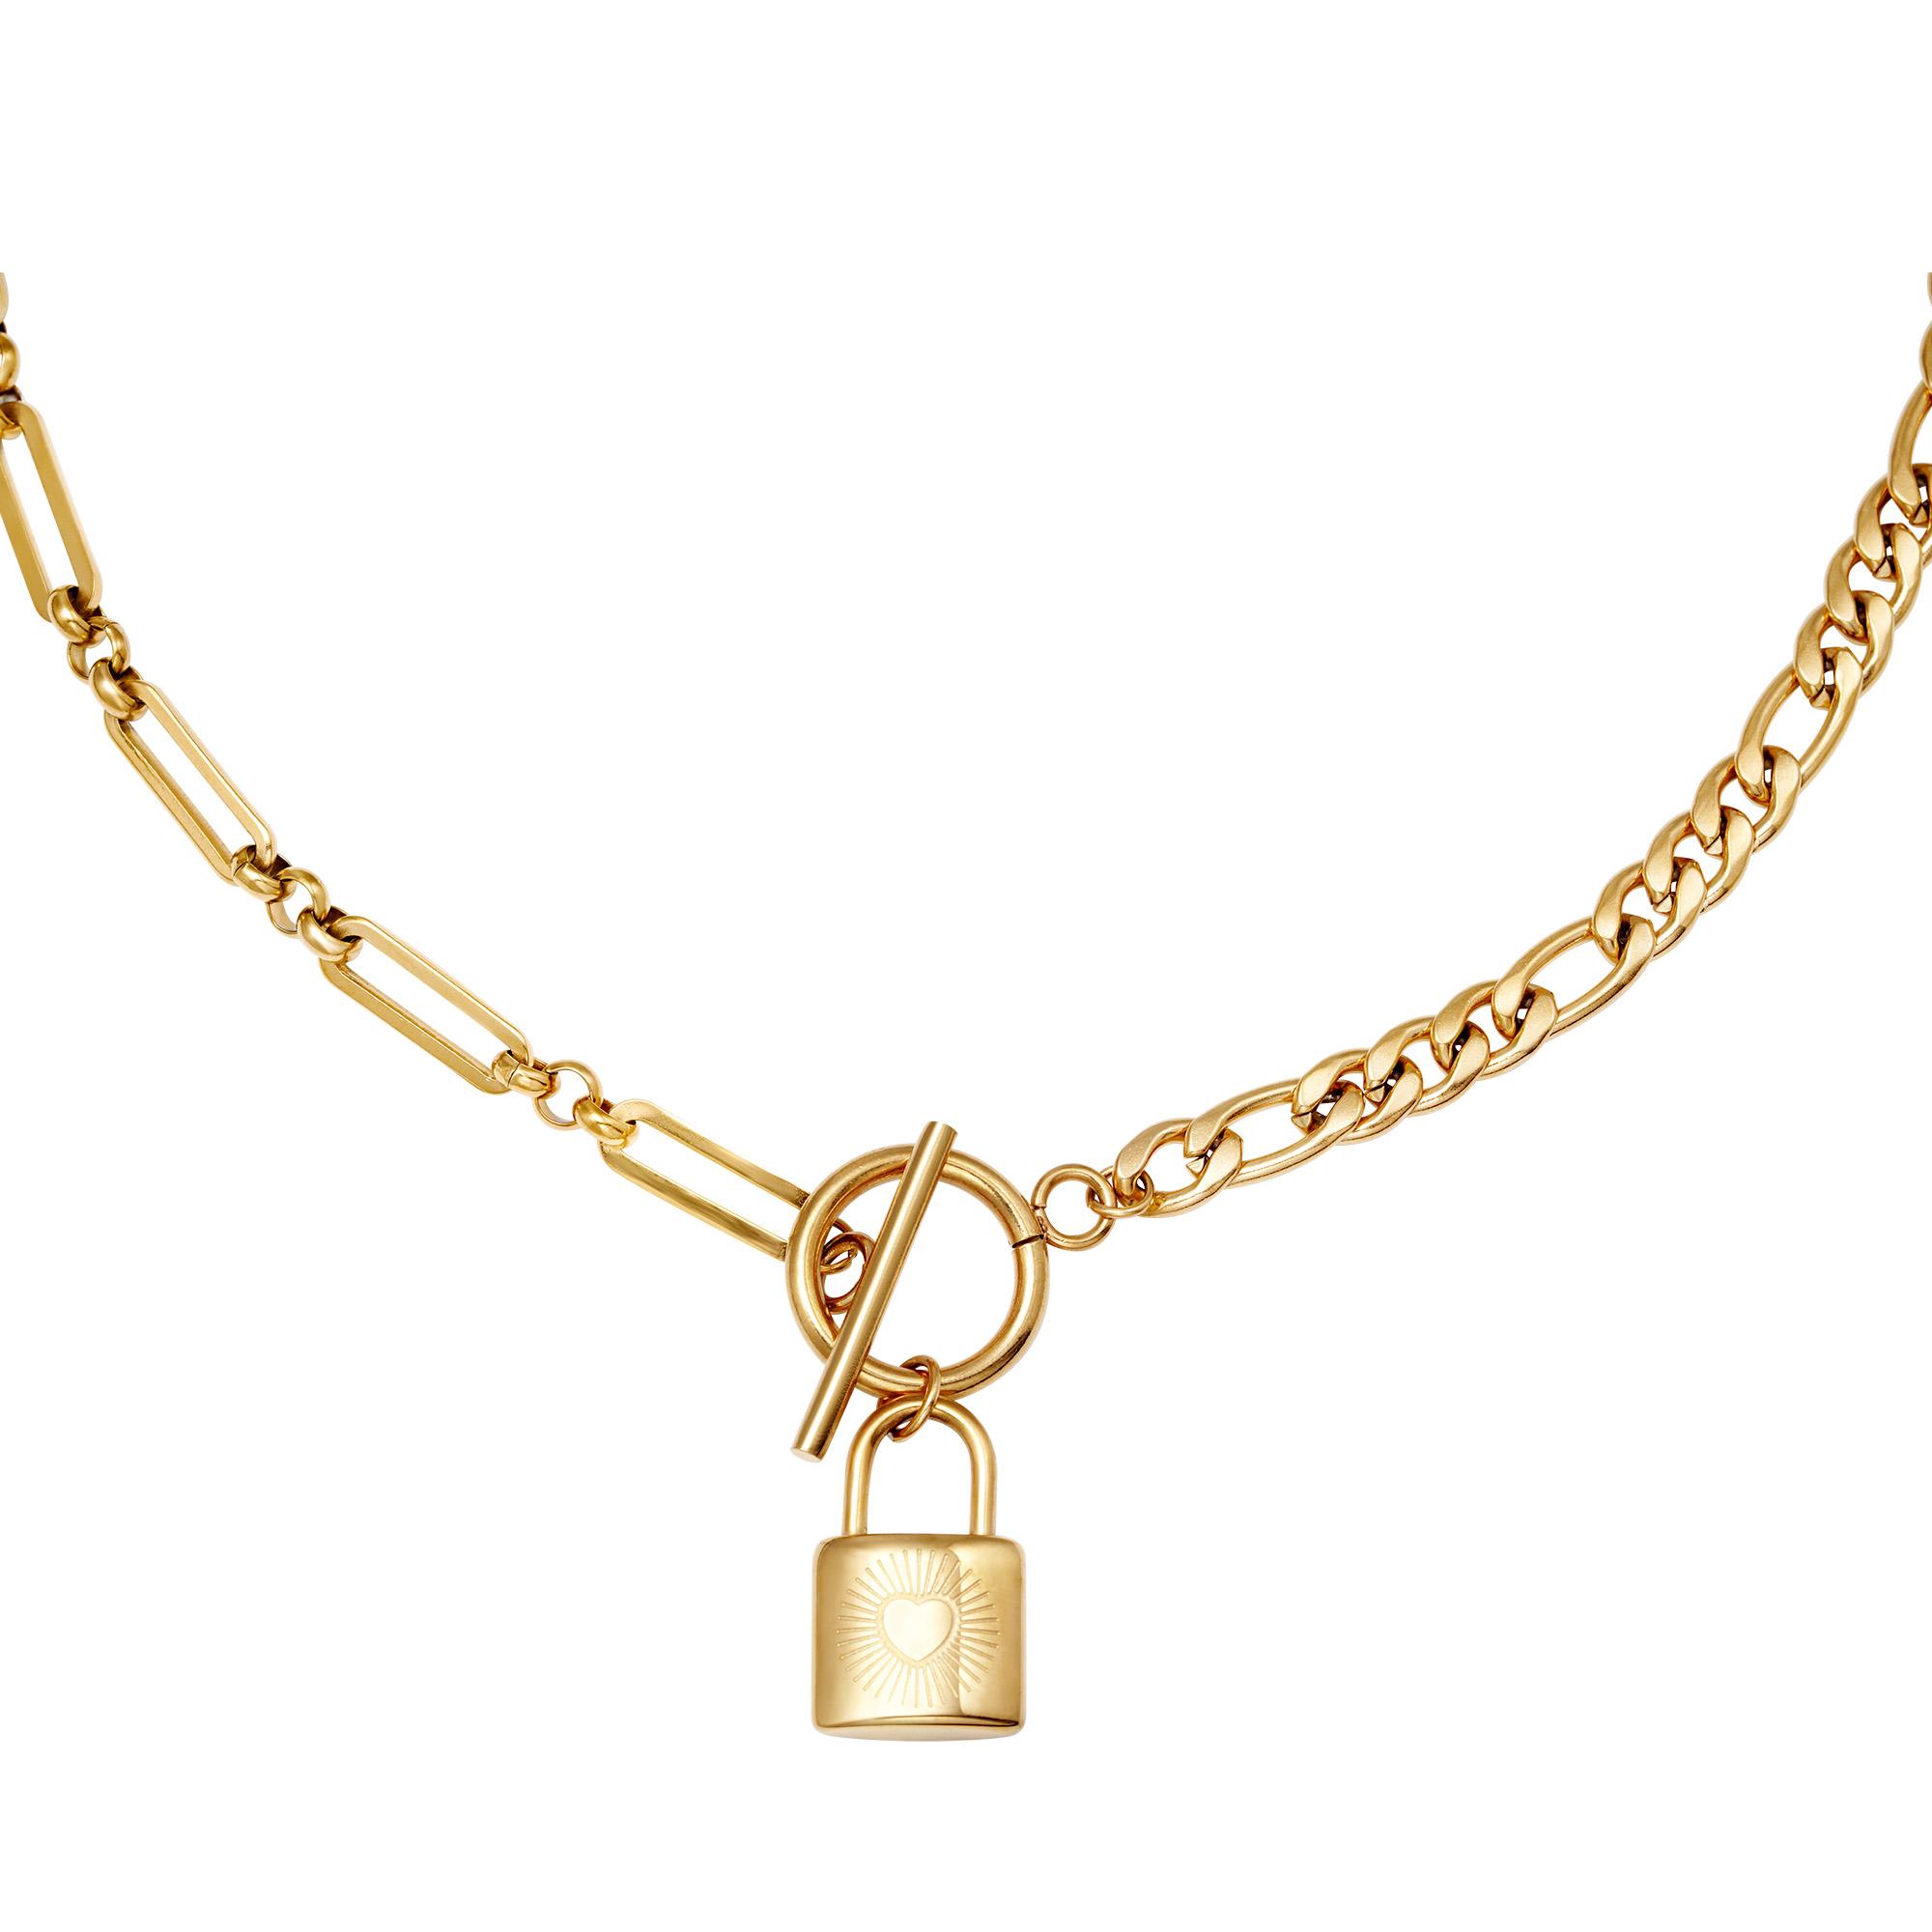 Ketting Chain & Lock Goud